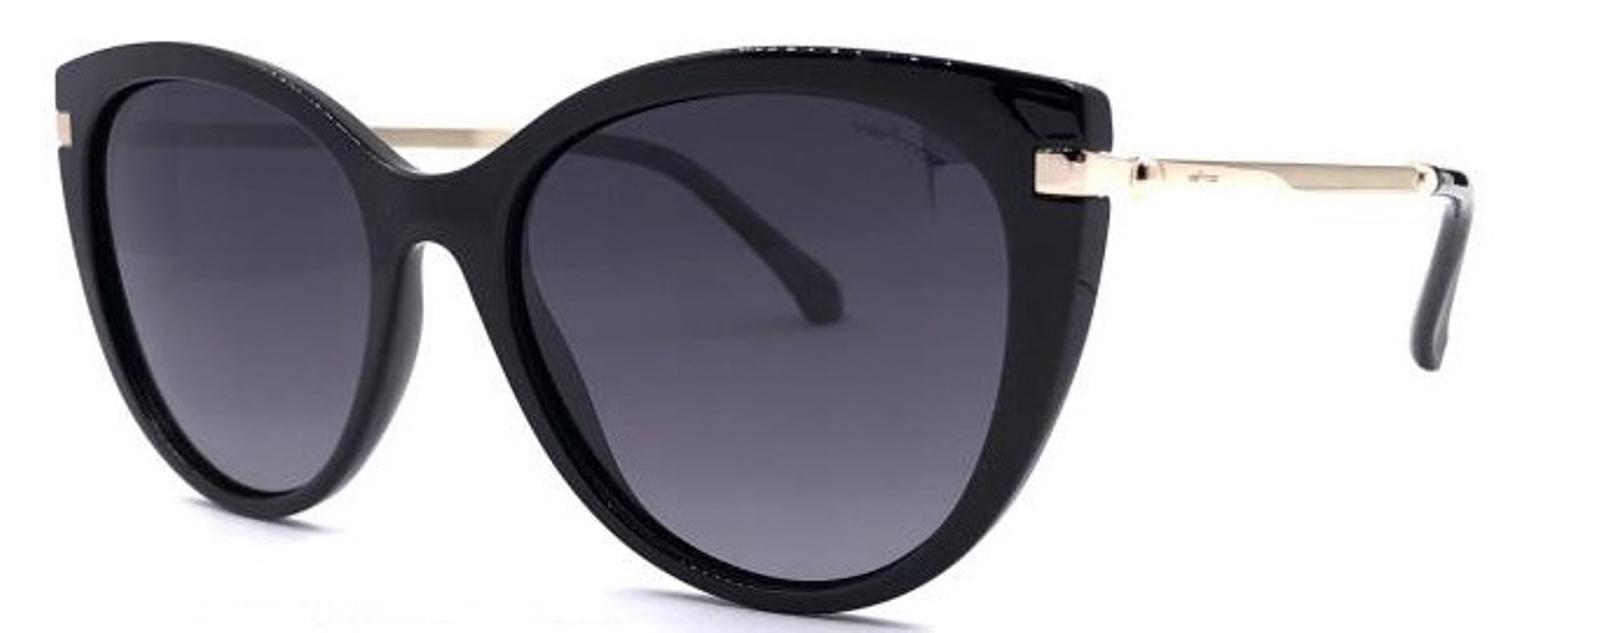 VS7095 C11 BLACK - VENTOE